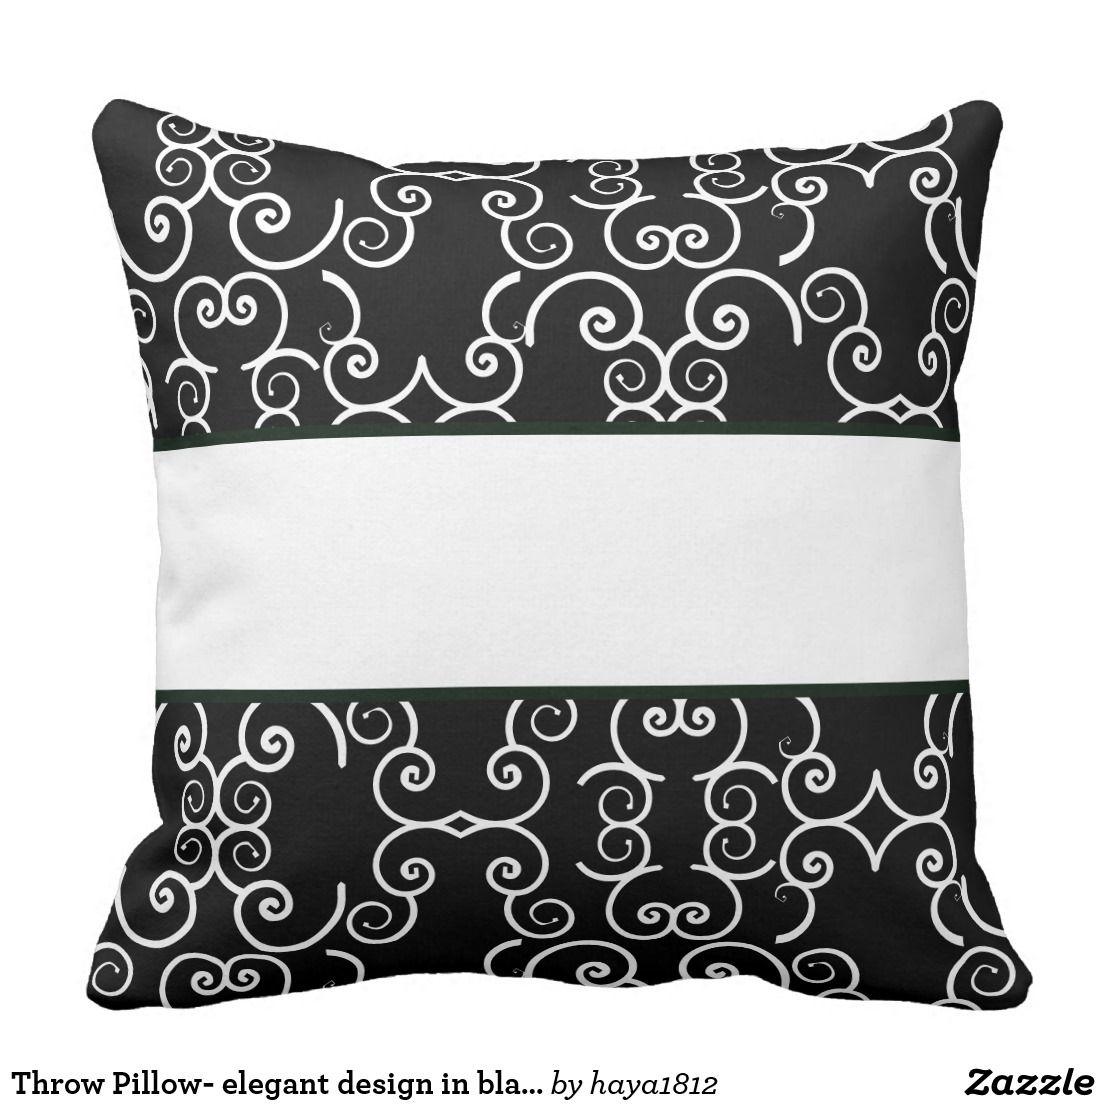 Throw Pillow Elegant Design In Black White Throw Pillow Elegant Pillow Pillows Throw Pillows